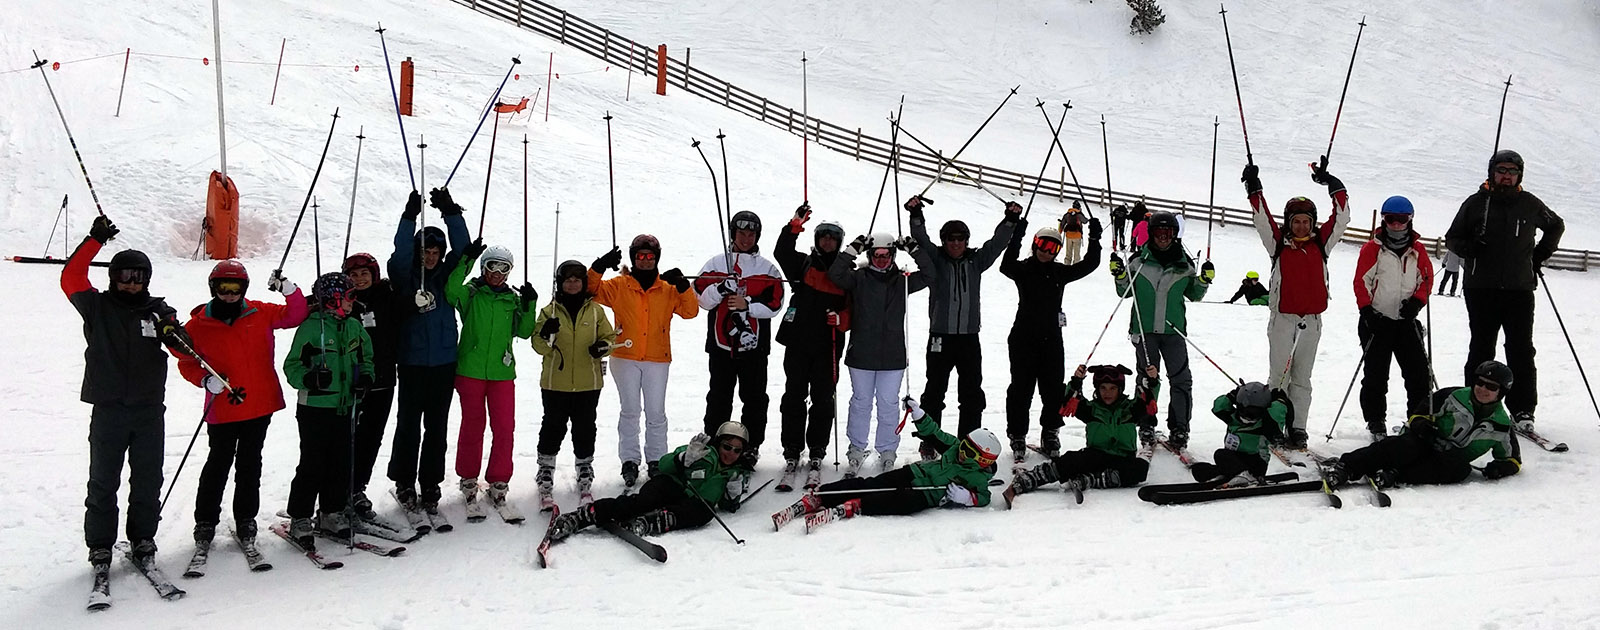 Viaje de esquí a Cerler